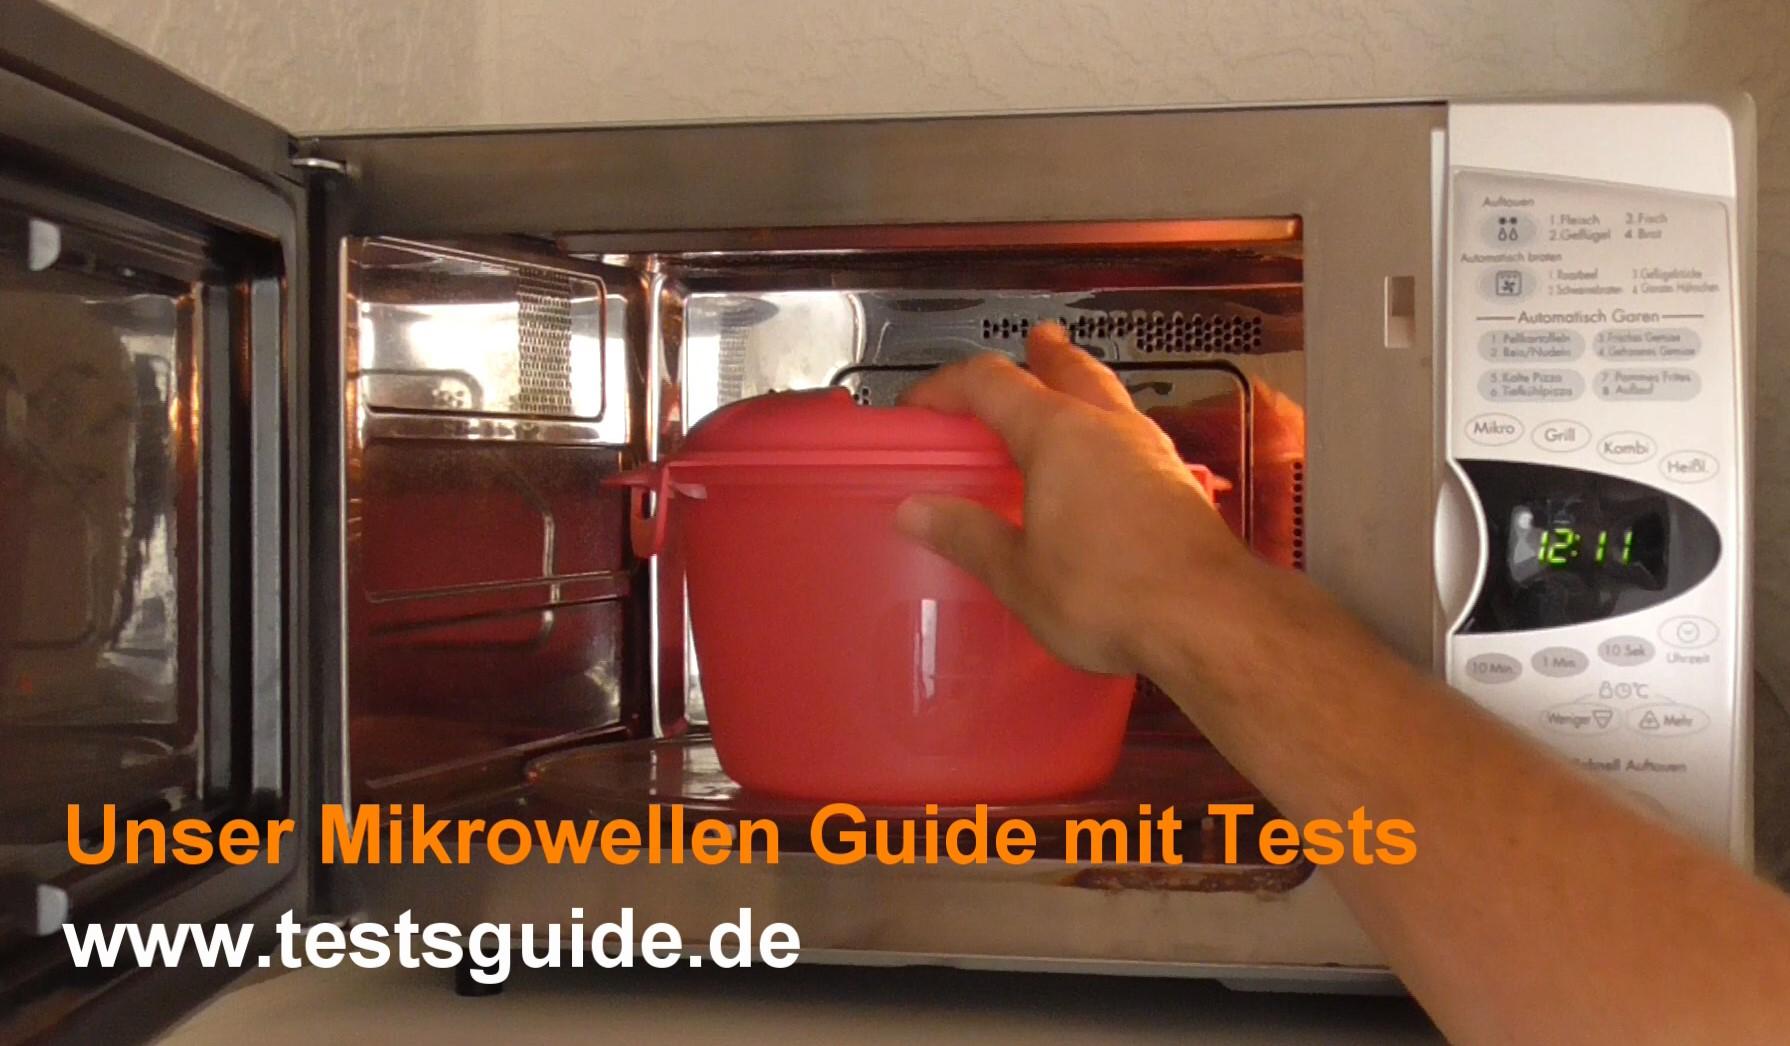 Mikrowellen-Reiskocher in den Mikrowellenherd stellen